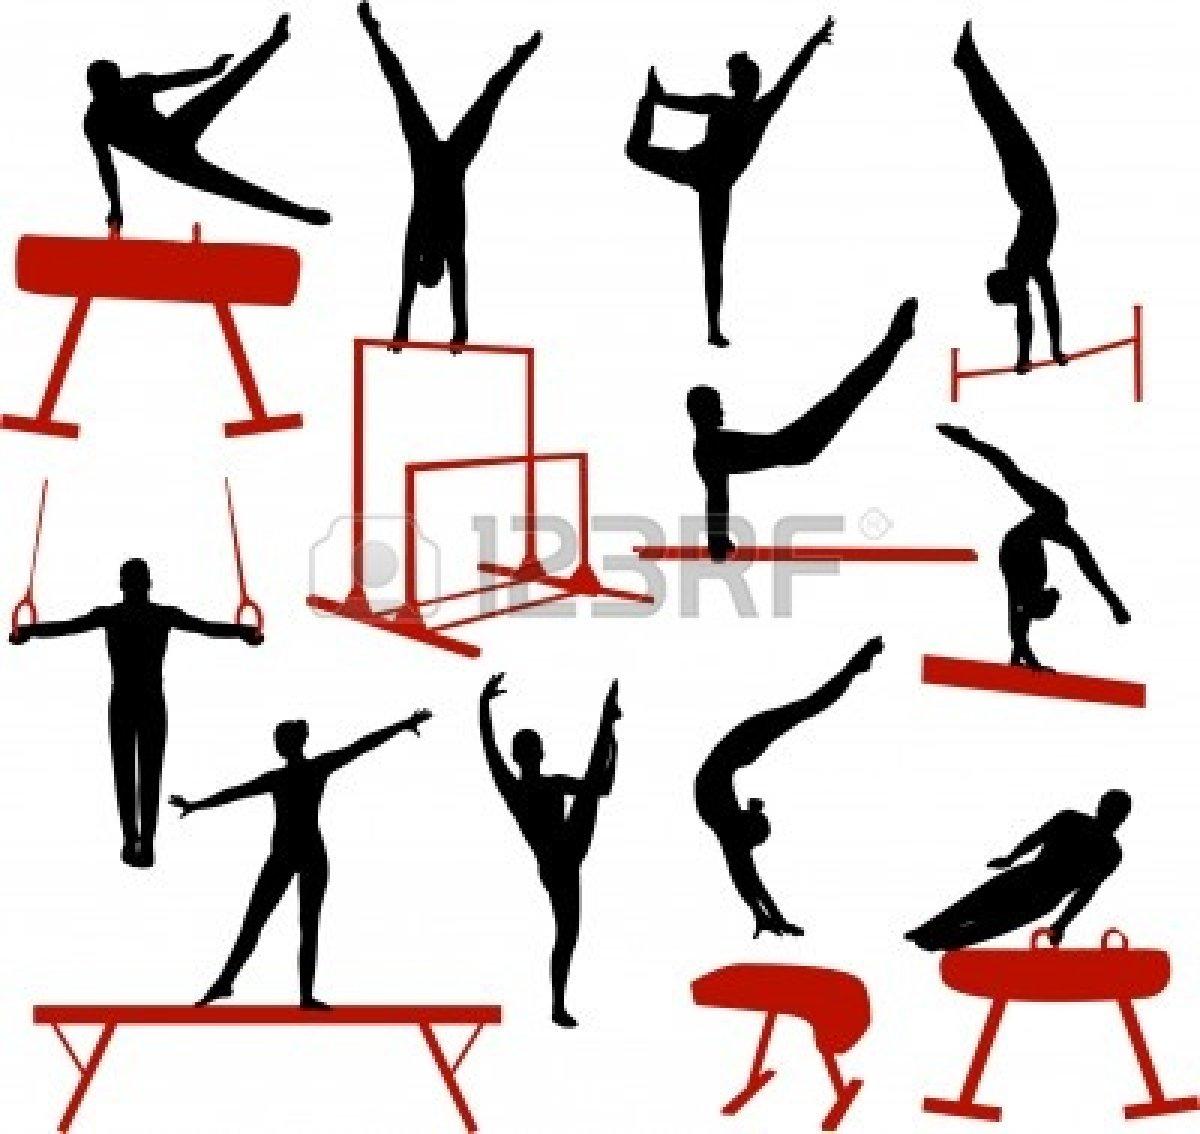 Gymnastics clipart silhouette vault svg black and white download Gymnastics clipart silhouette vault - ClipartFest svg black and white download